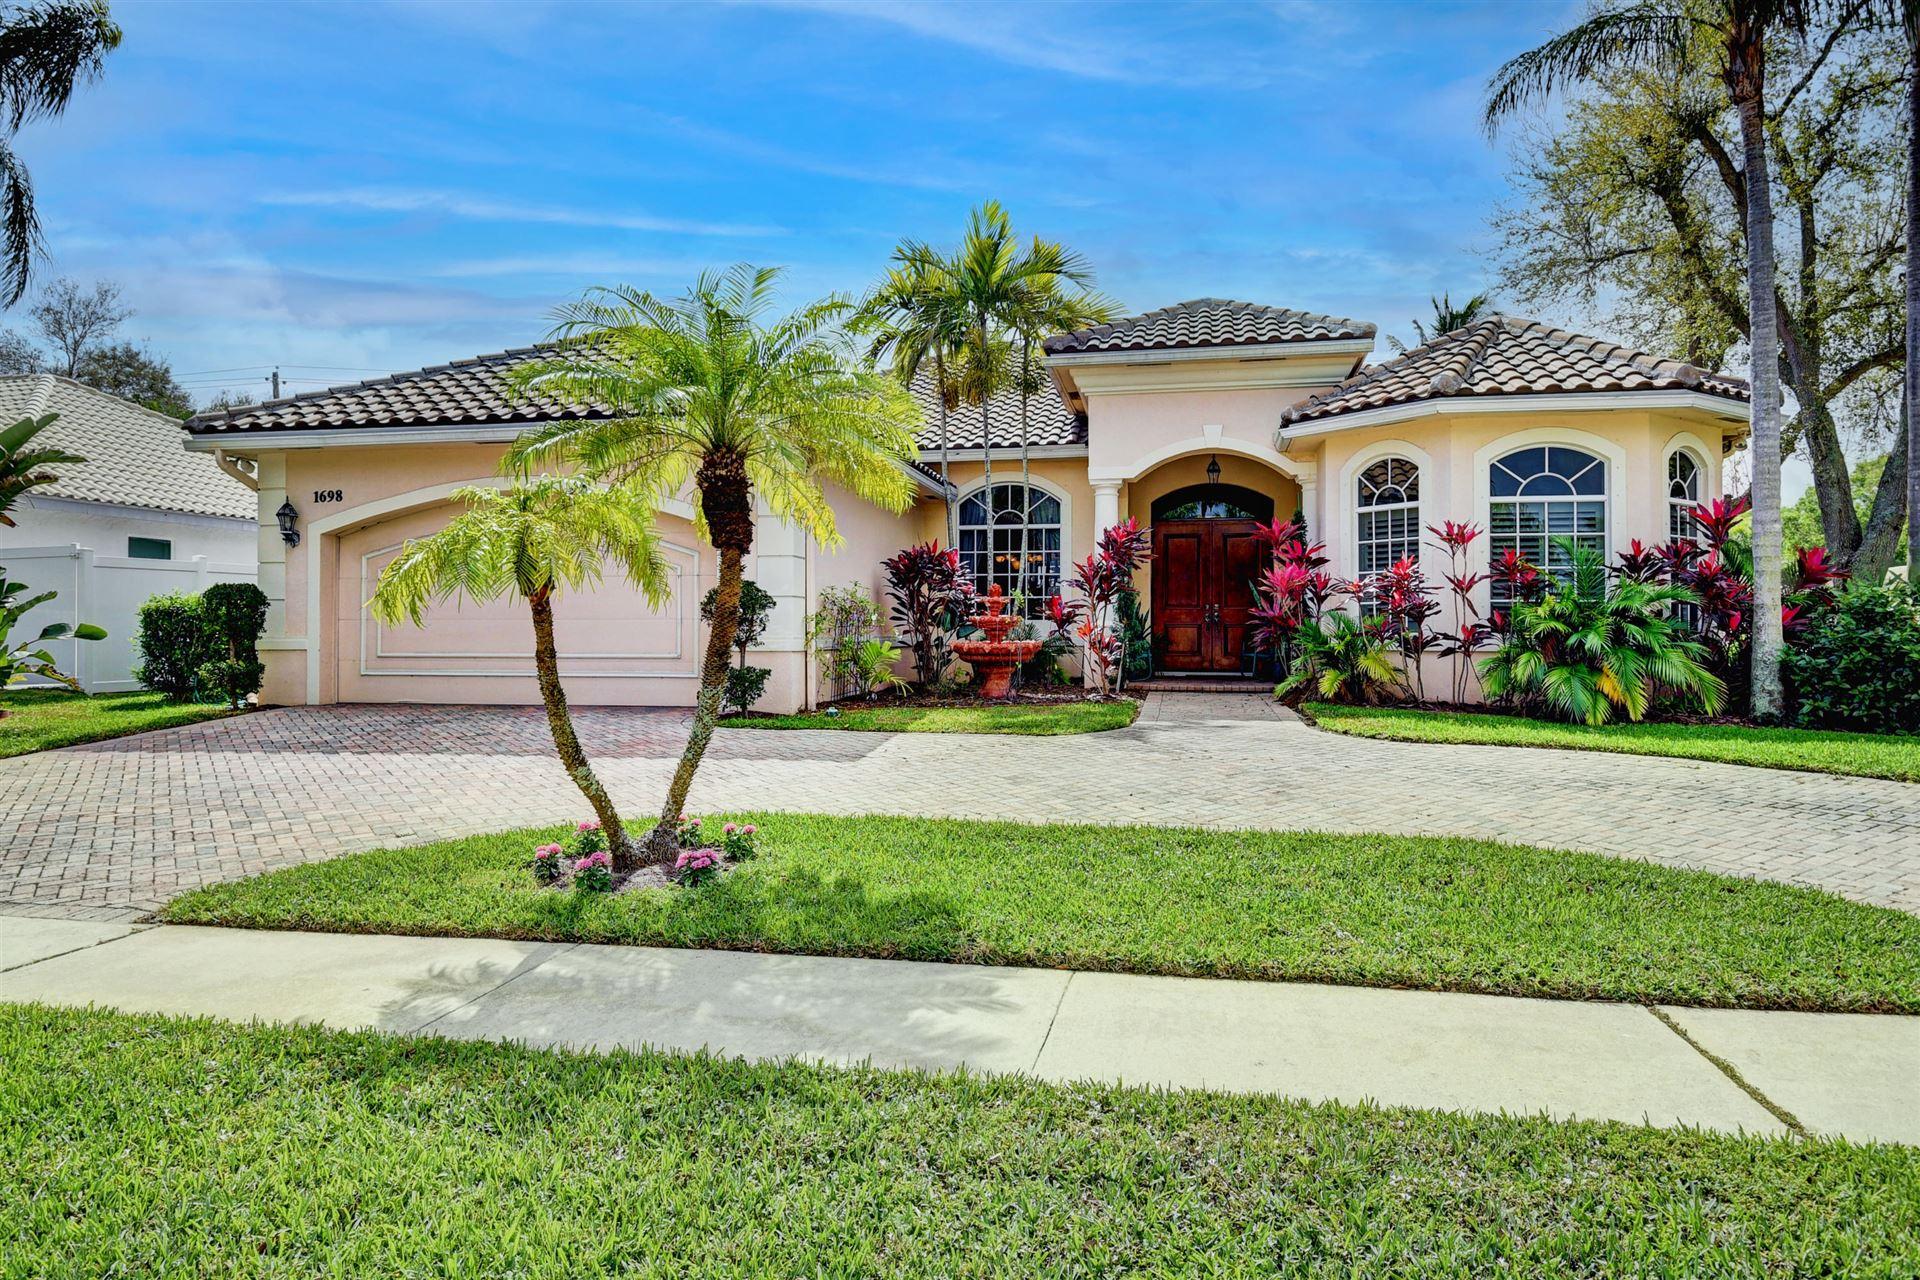 1698 SW 15th Street, Boca Raton, FL 33486 - #: RX-10694459